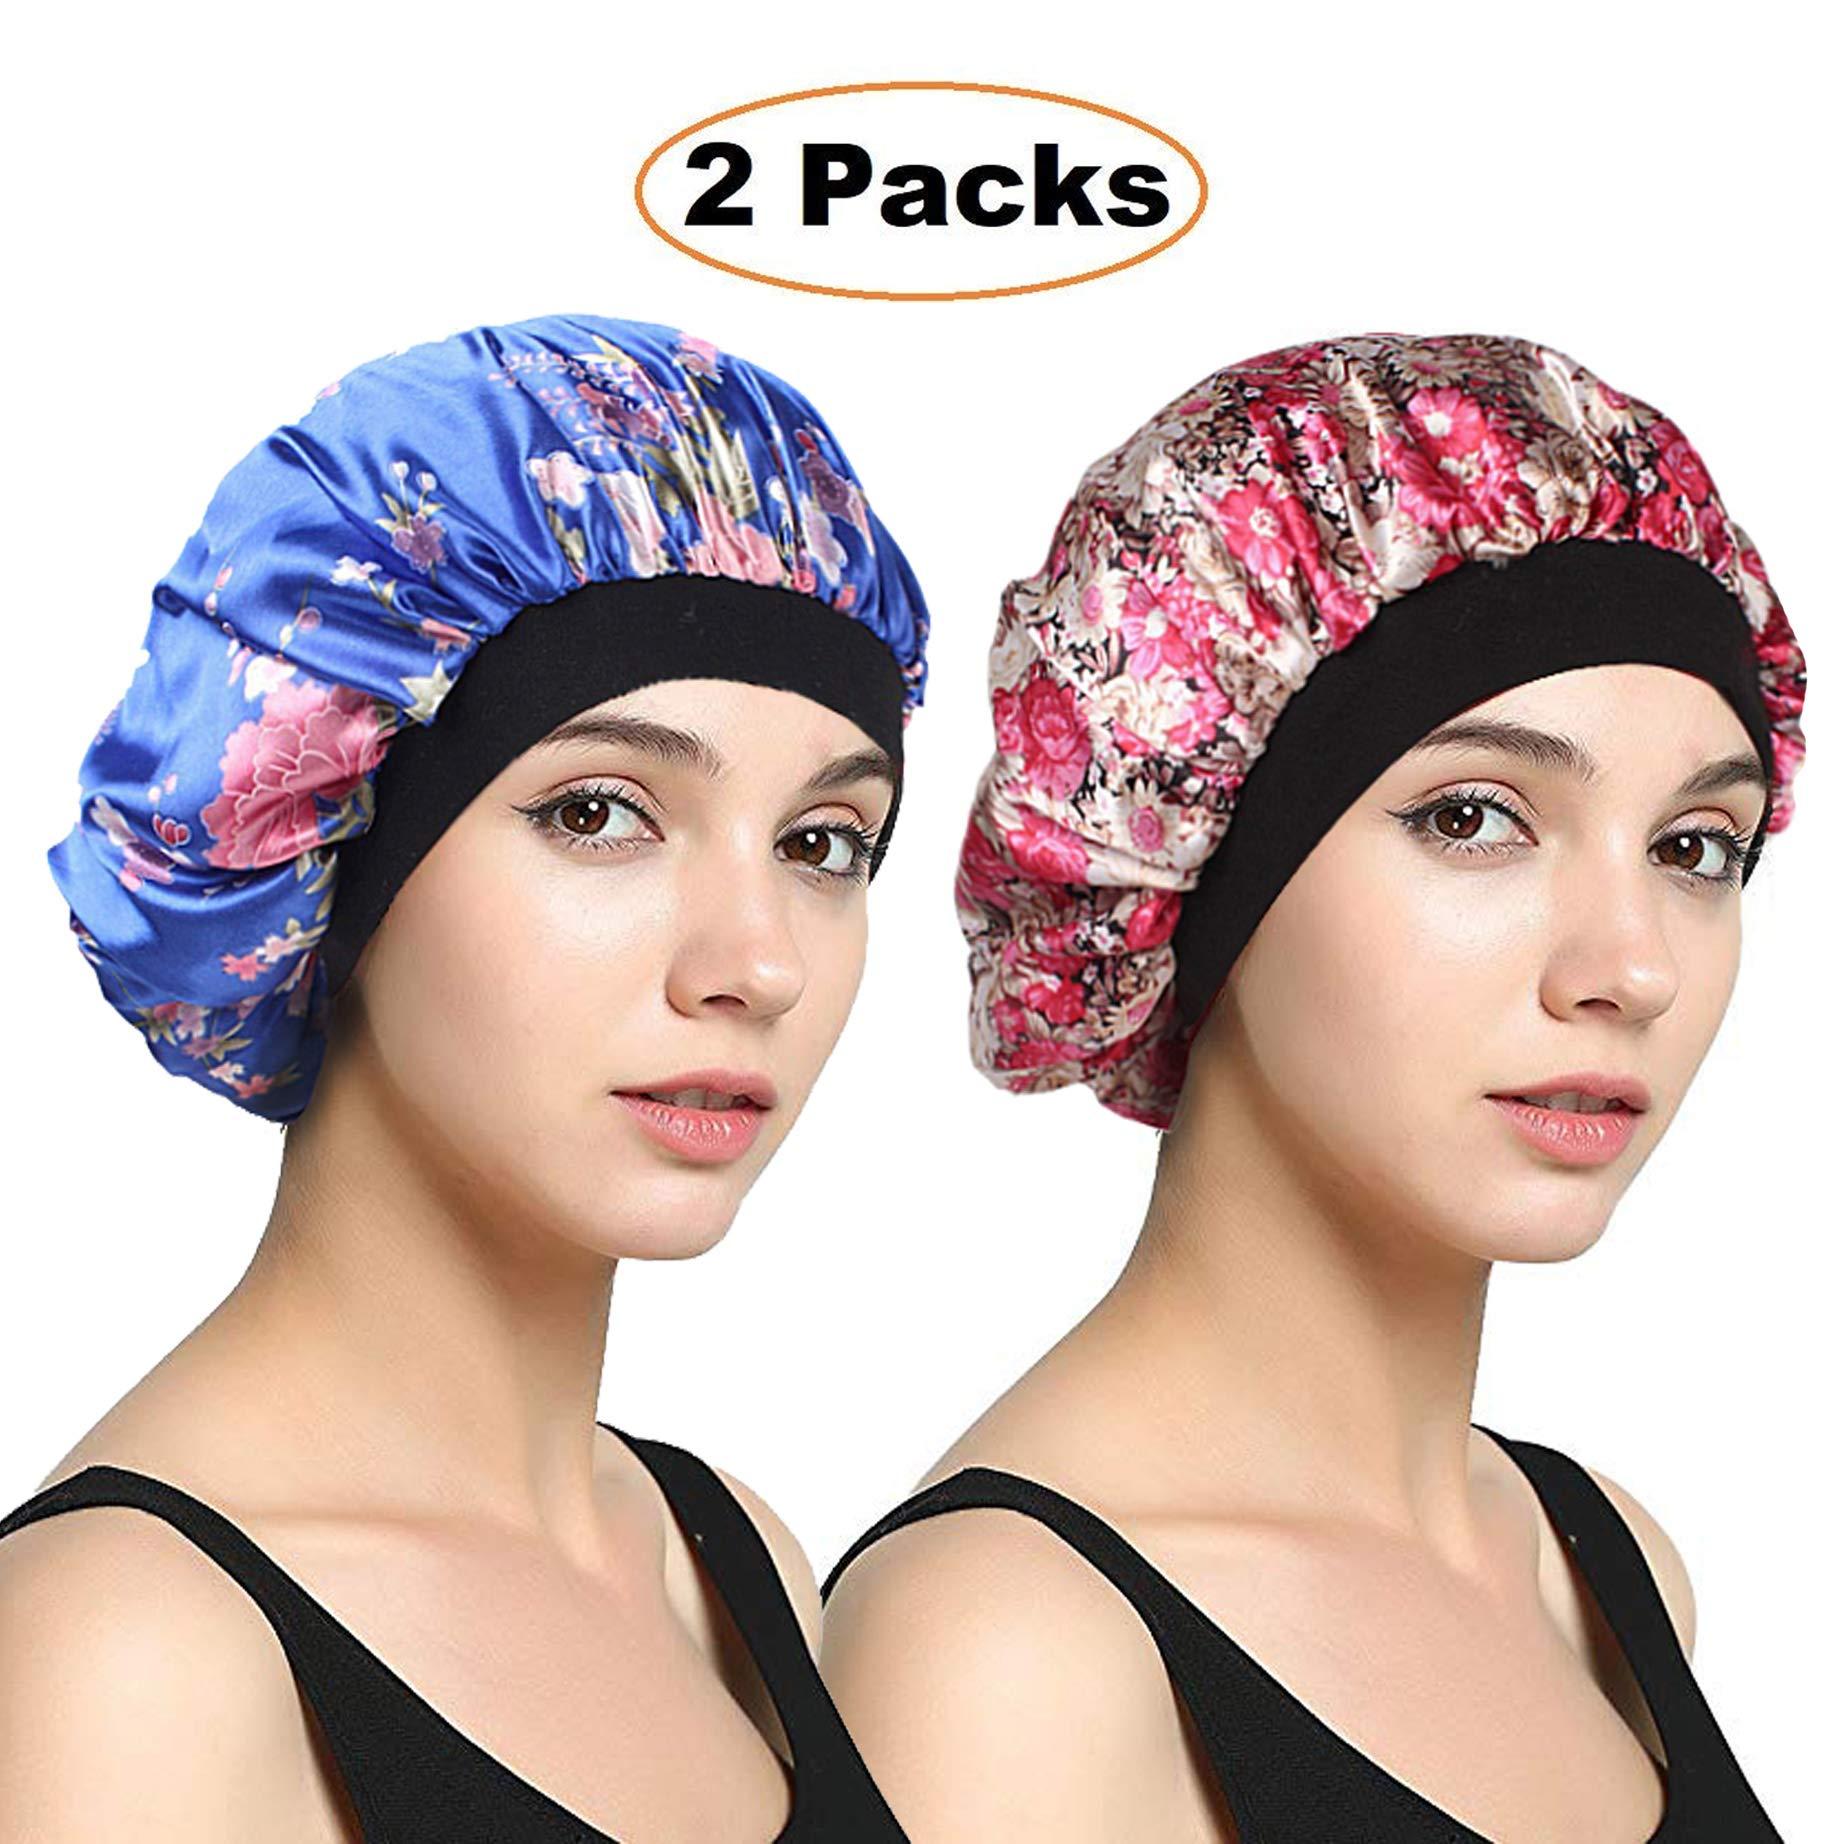 EINSKEY Womens Satin Bonnet 2-Packs Sleeping Cap Night Cap Hair Cap Elastic Band